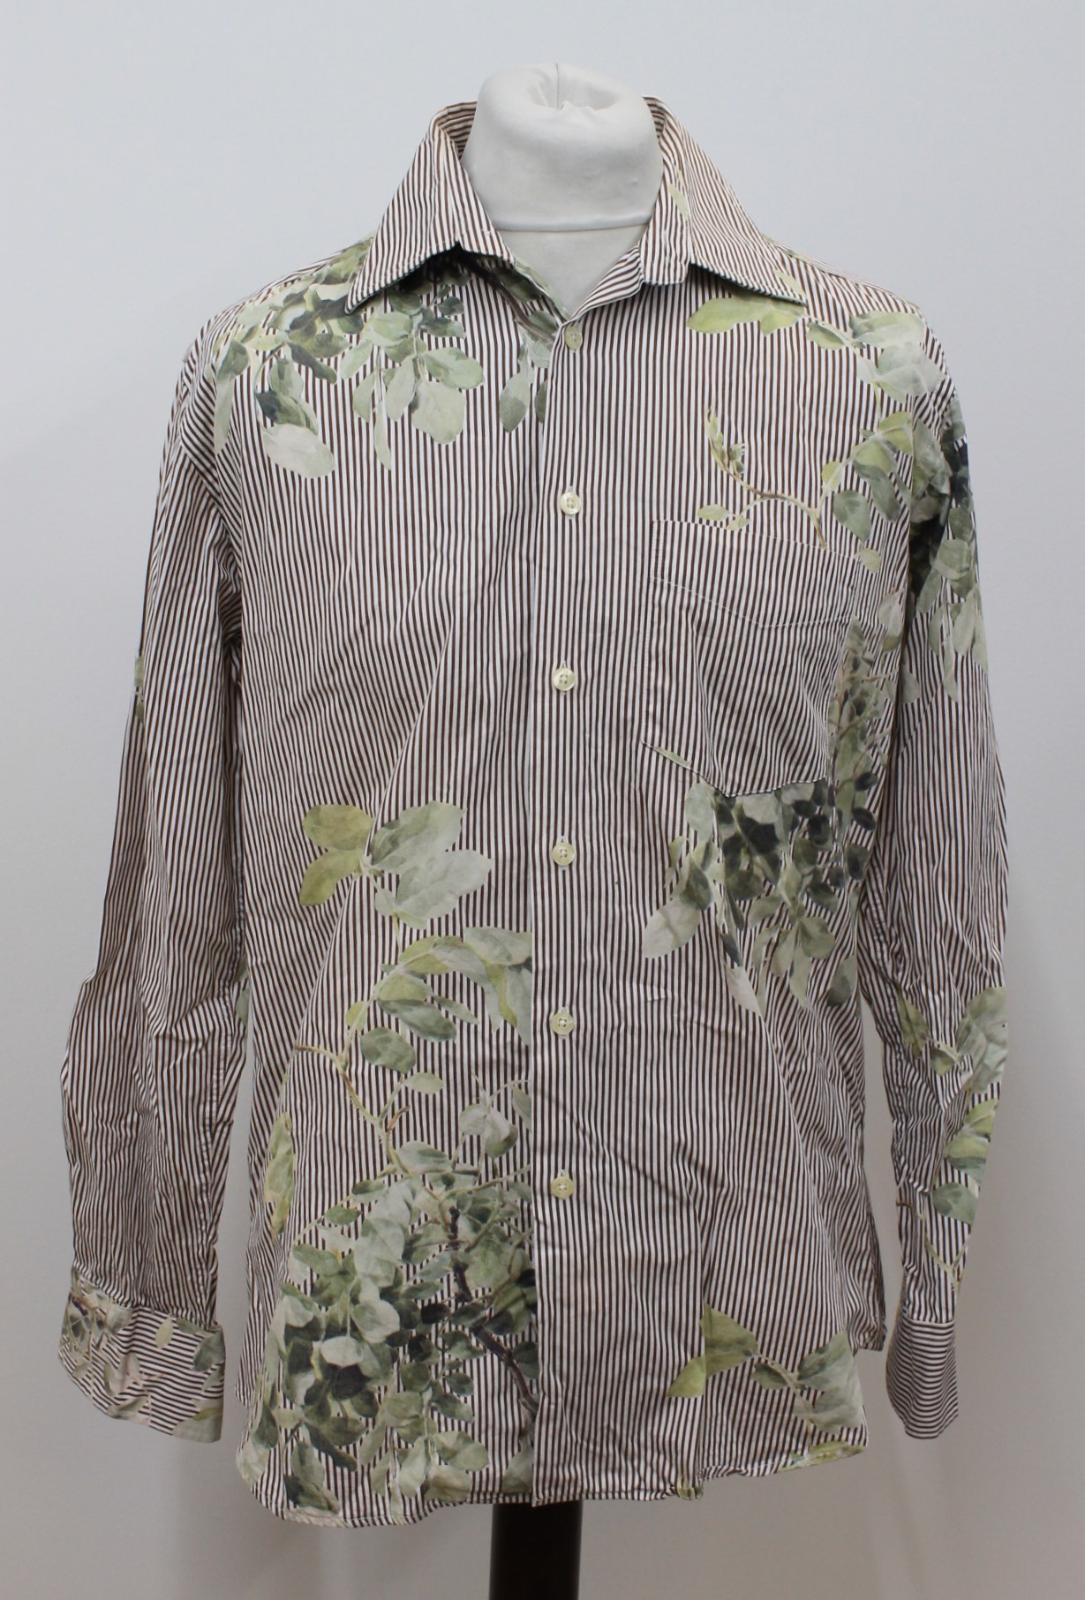 Paul-Smith-Para-Hombre-Marron-Verde-A-Rayas-Manga-Larga-de-impresion-de-hojas-Algodon-Camisa-Tamano miniatura 2